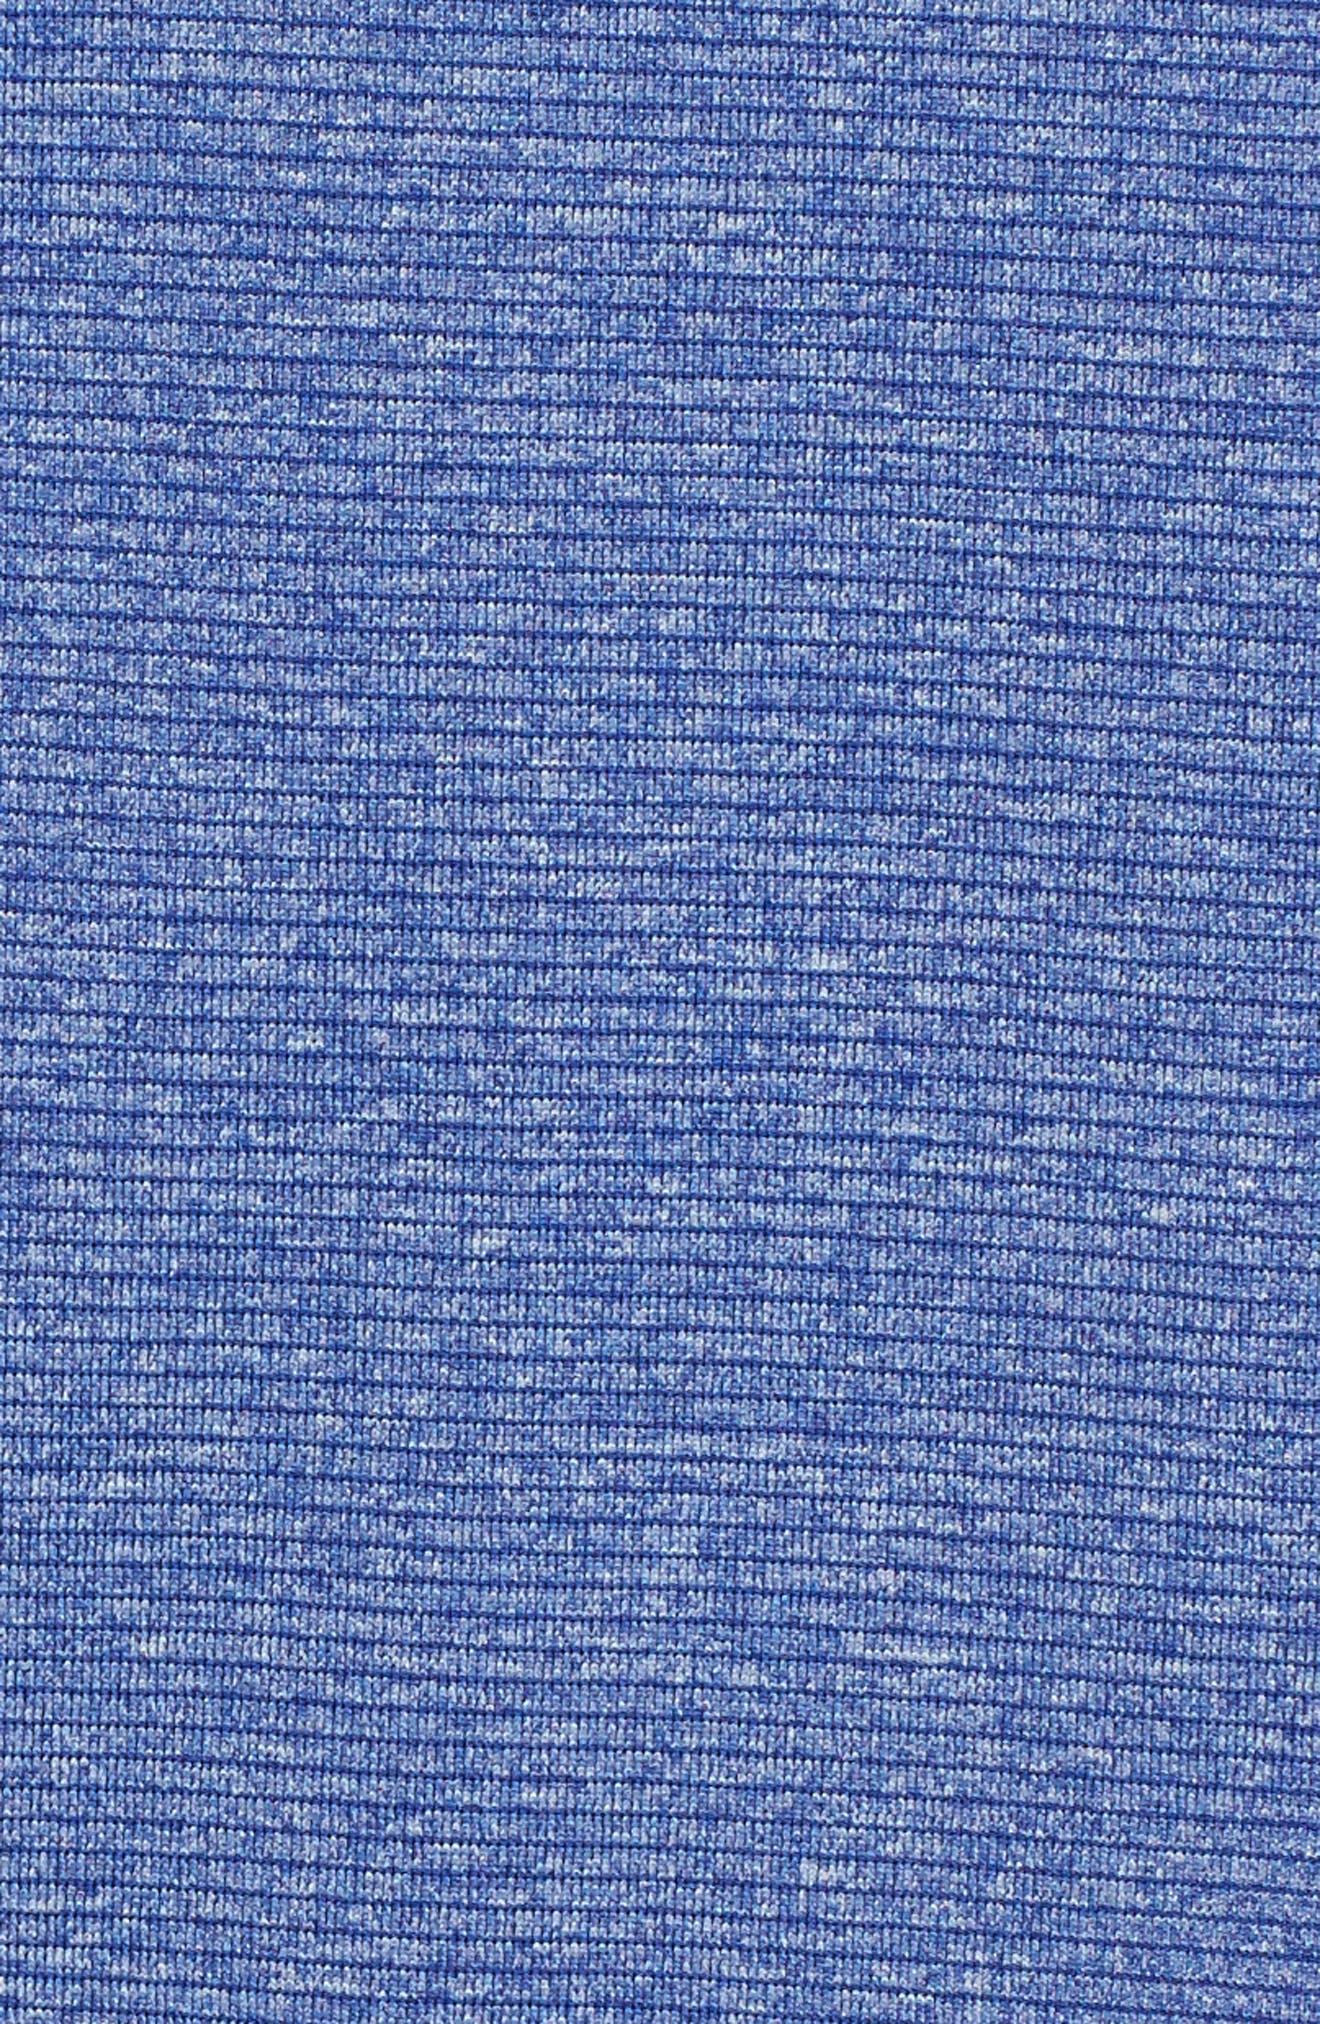 Shoreline - New York Giants Half Zip Pullover,                             Alternate thumbnail 5, color,                             425